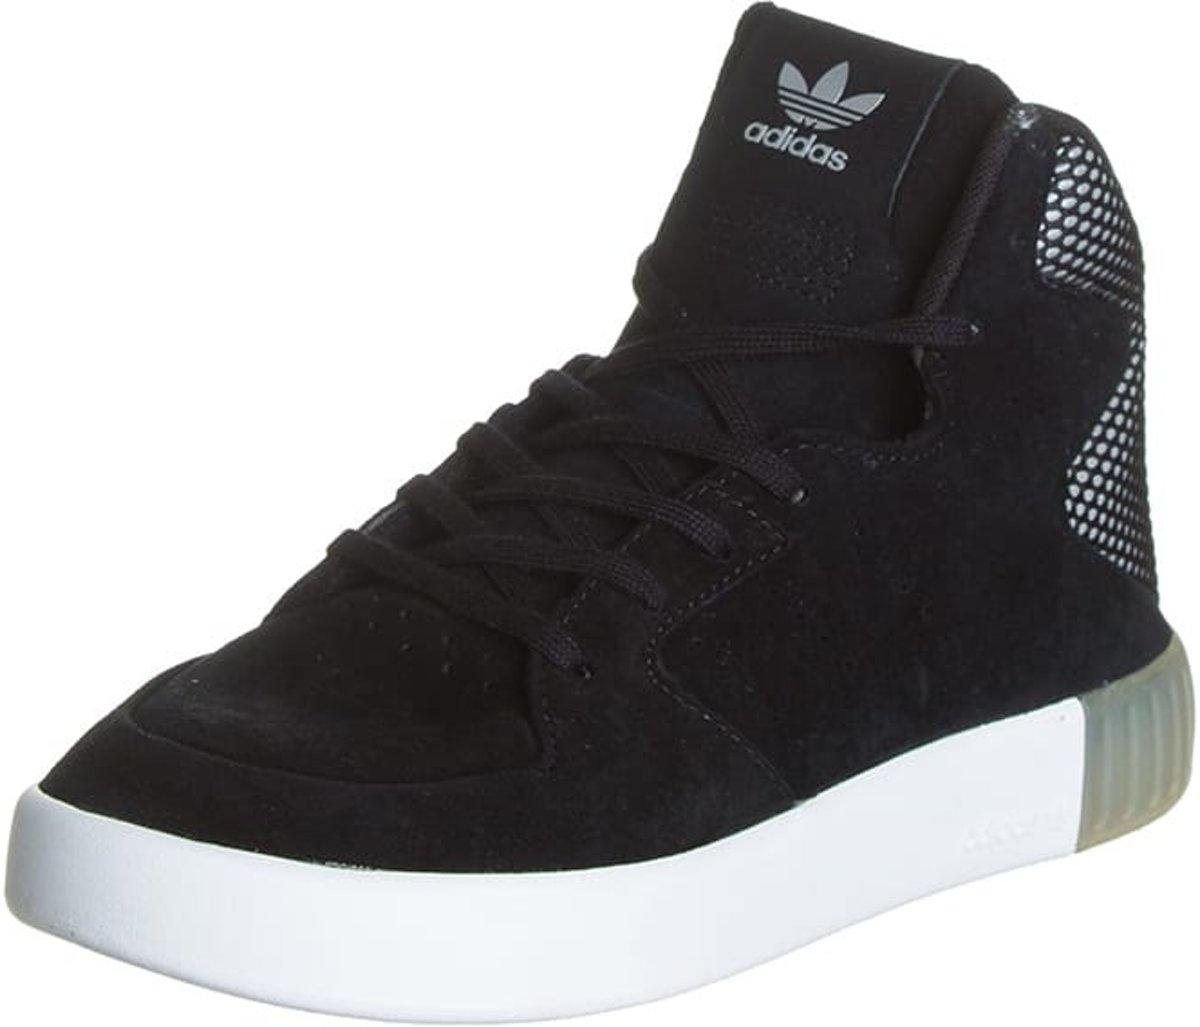 1dba8eb9f60 bol.com | Adidas Sneakers Tubular Invader 2.0 Zwart Maat 36